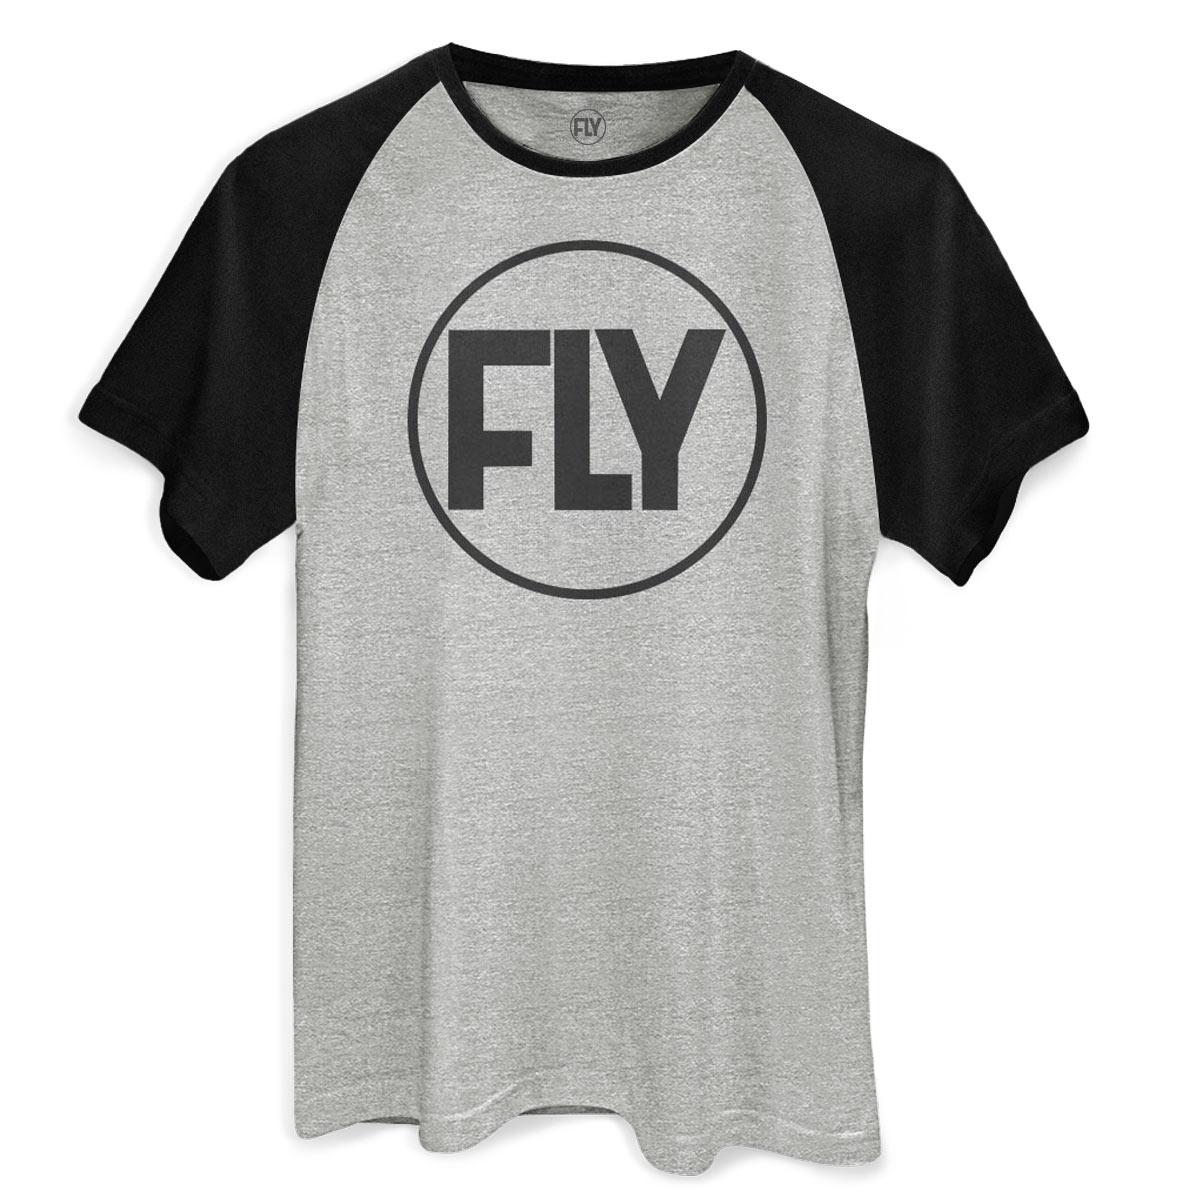 Camiseta Raglan Masculina Banda Fly Logo